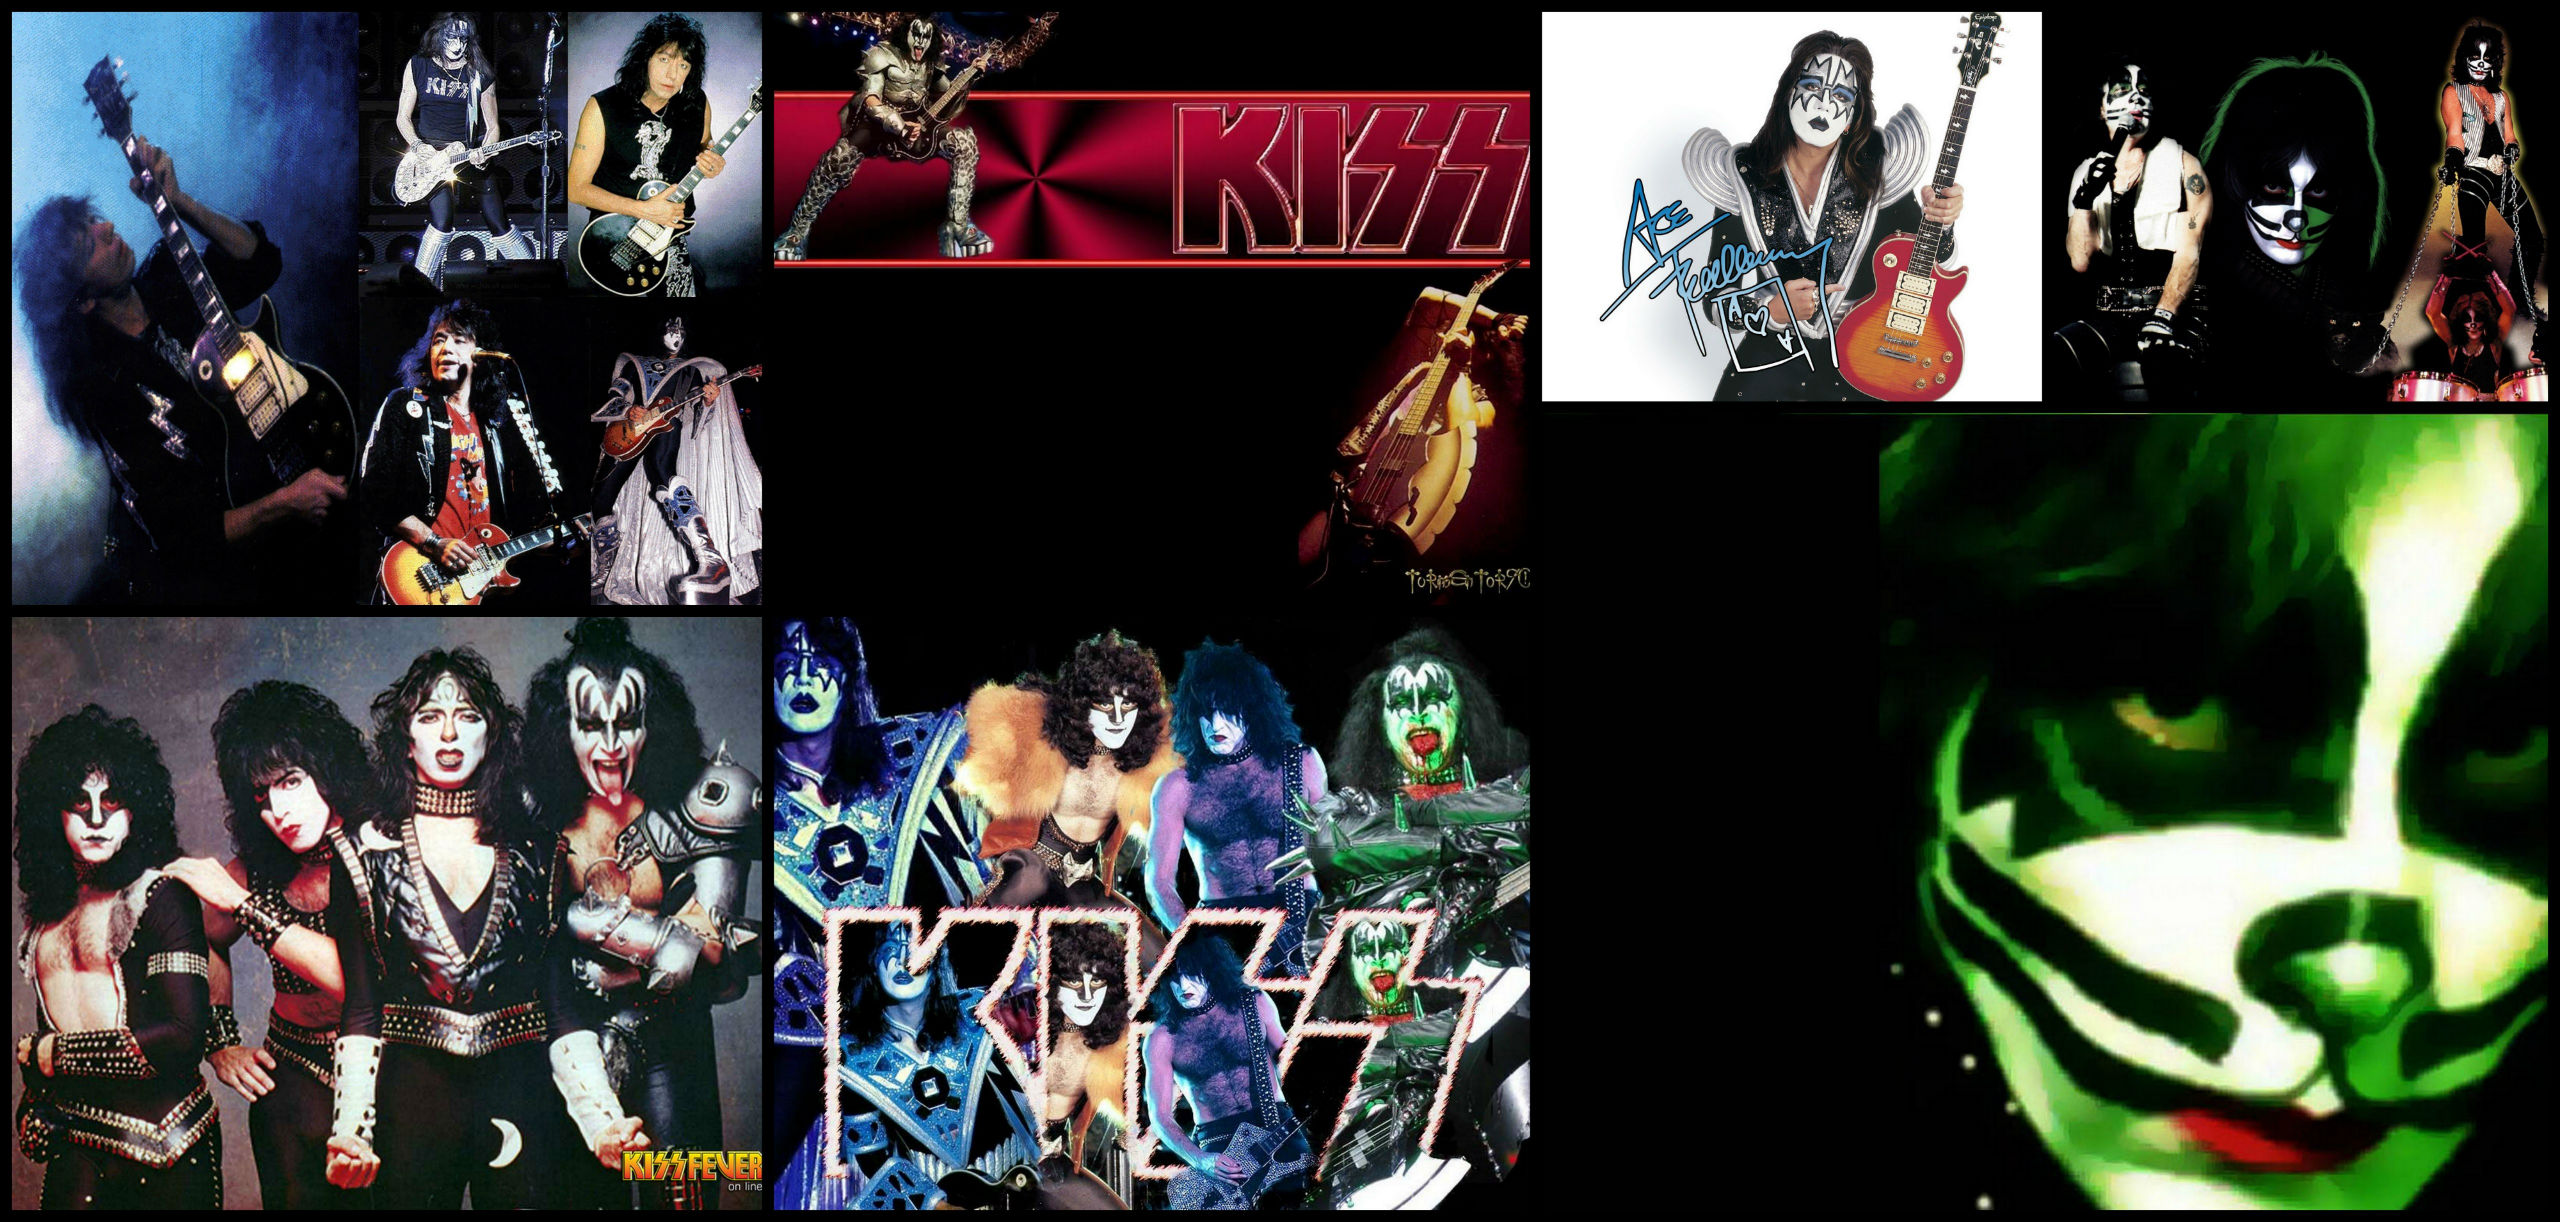 Kiss heavy metal rock bands concert guitar e wallpaper background 2560x1222